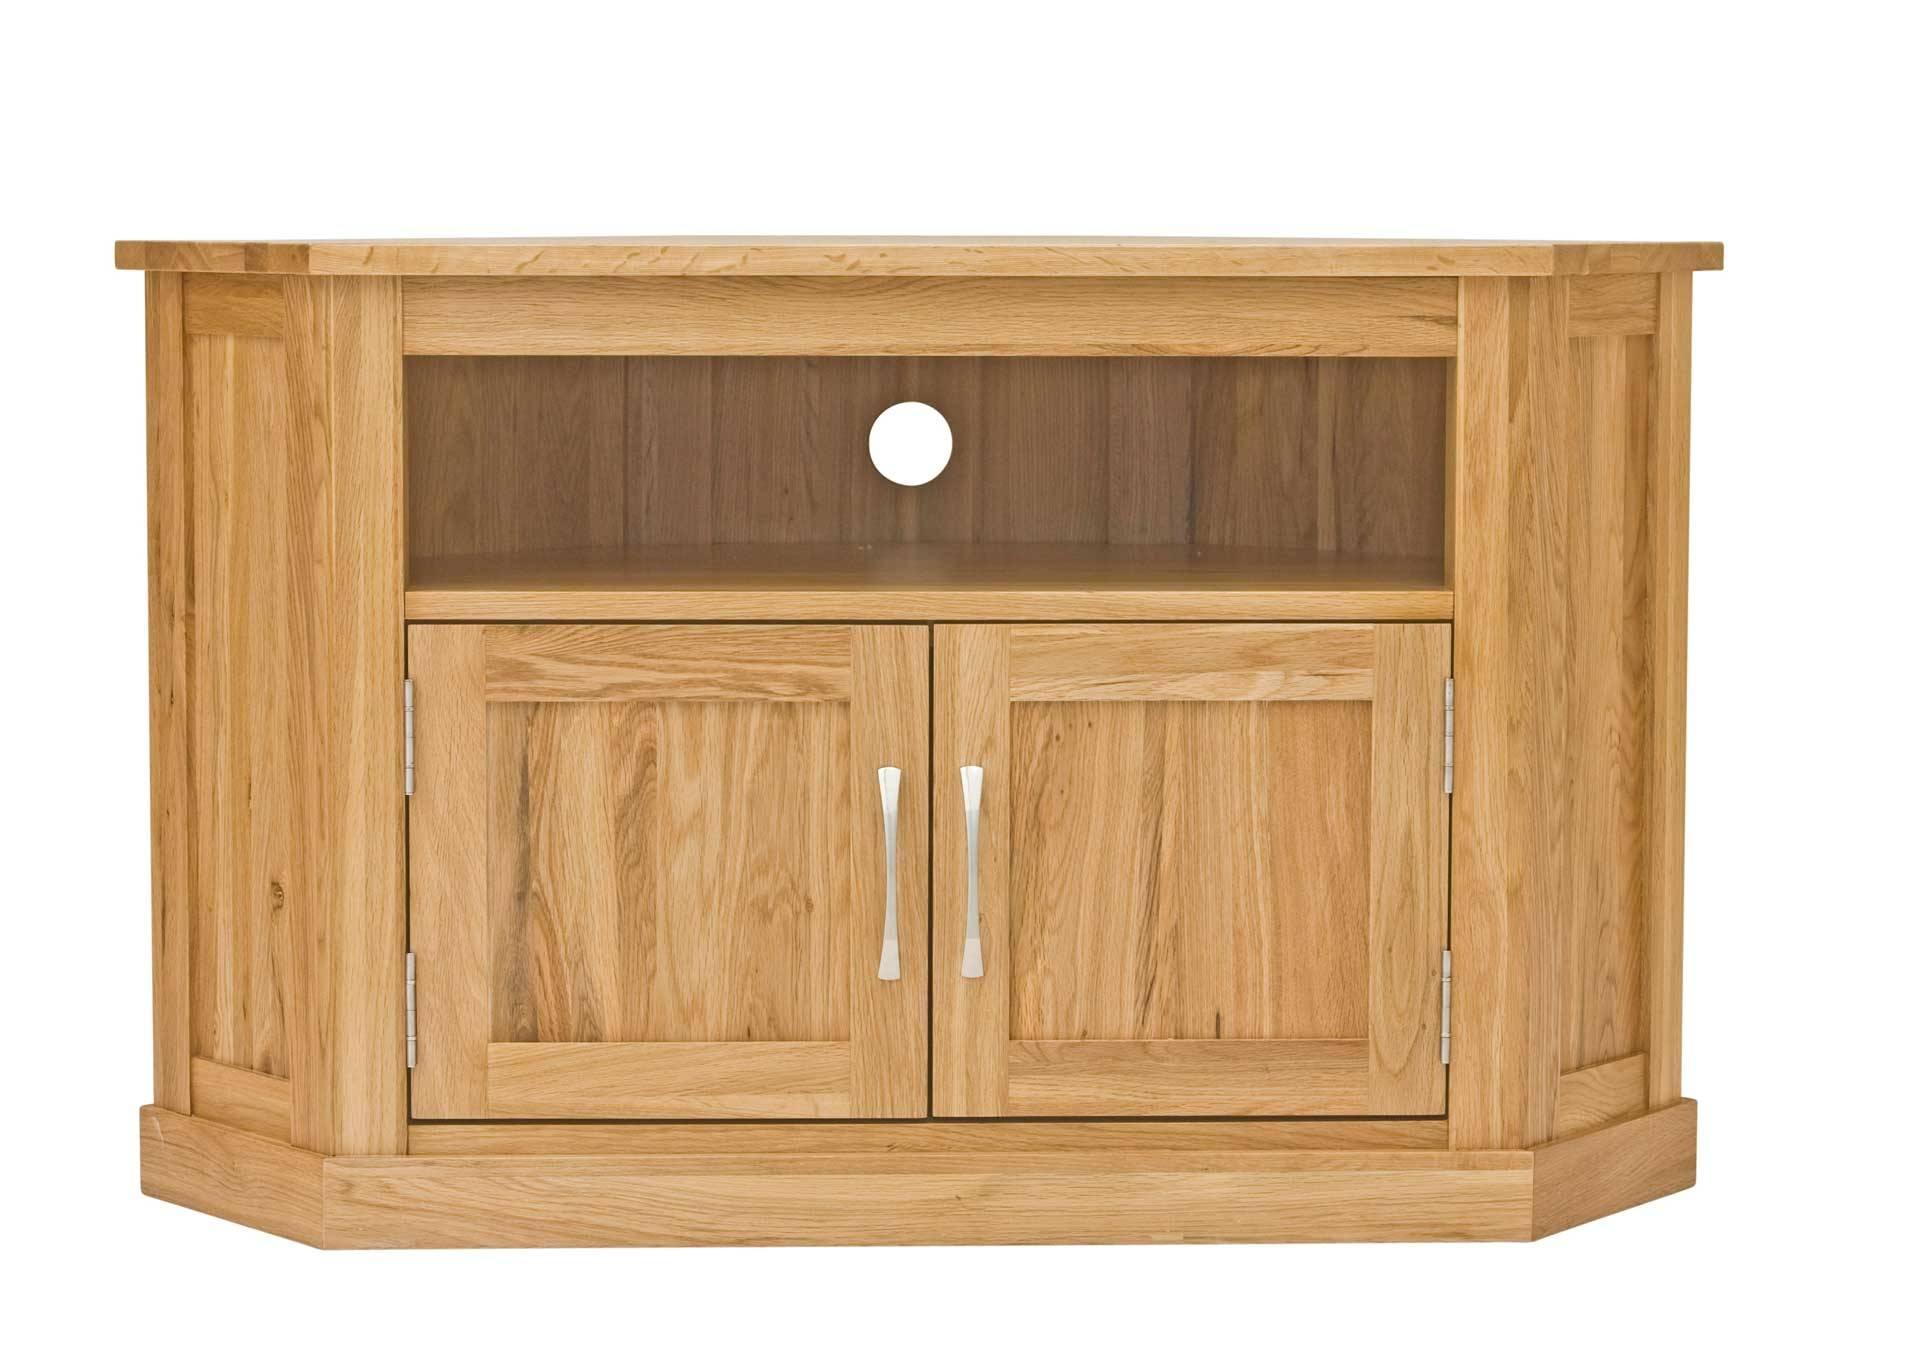 Classic Oak Corner Television Cabinet | Hampshire Furniture for Solid Oak Corner Tv Cabinets (Image 5 of 15)